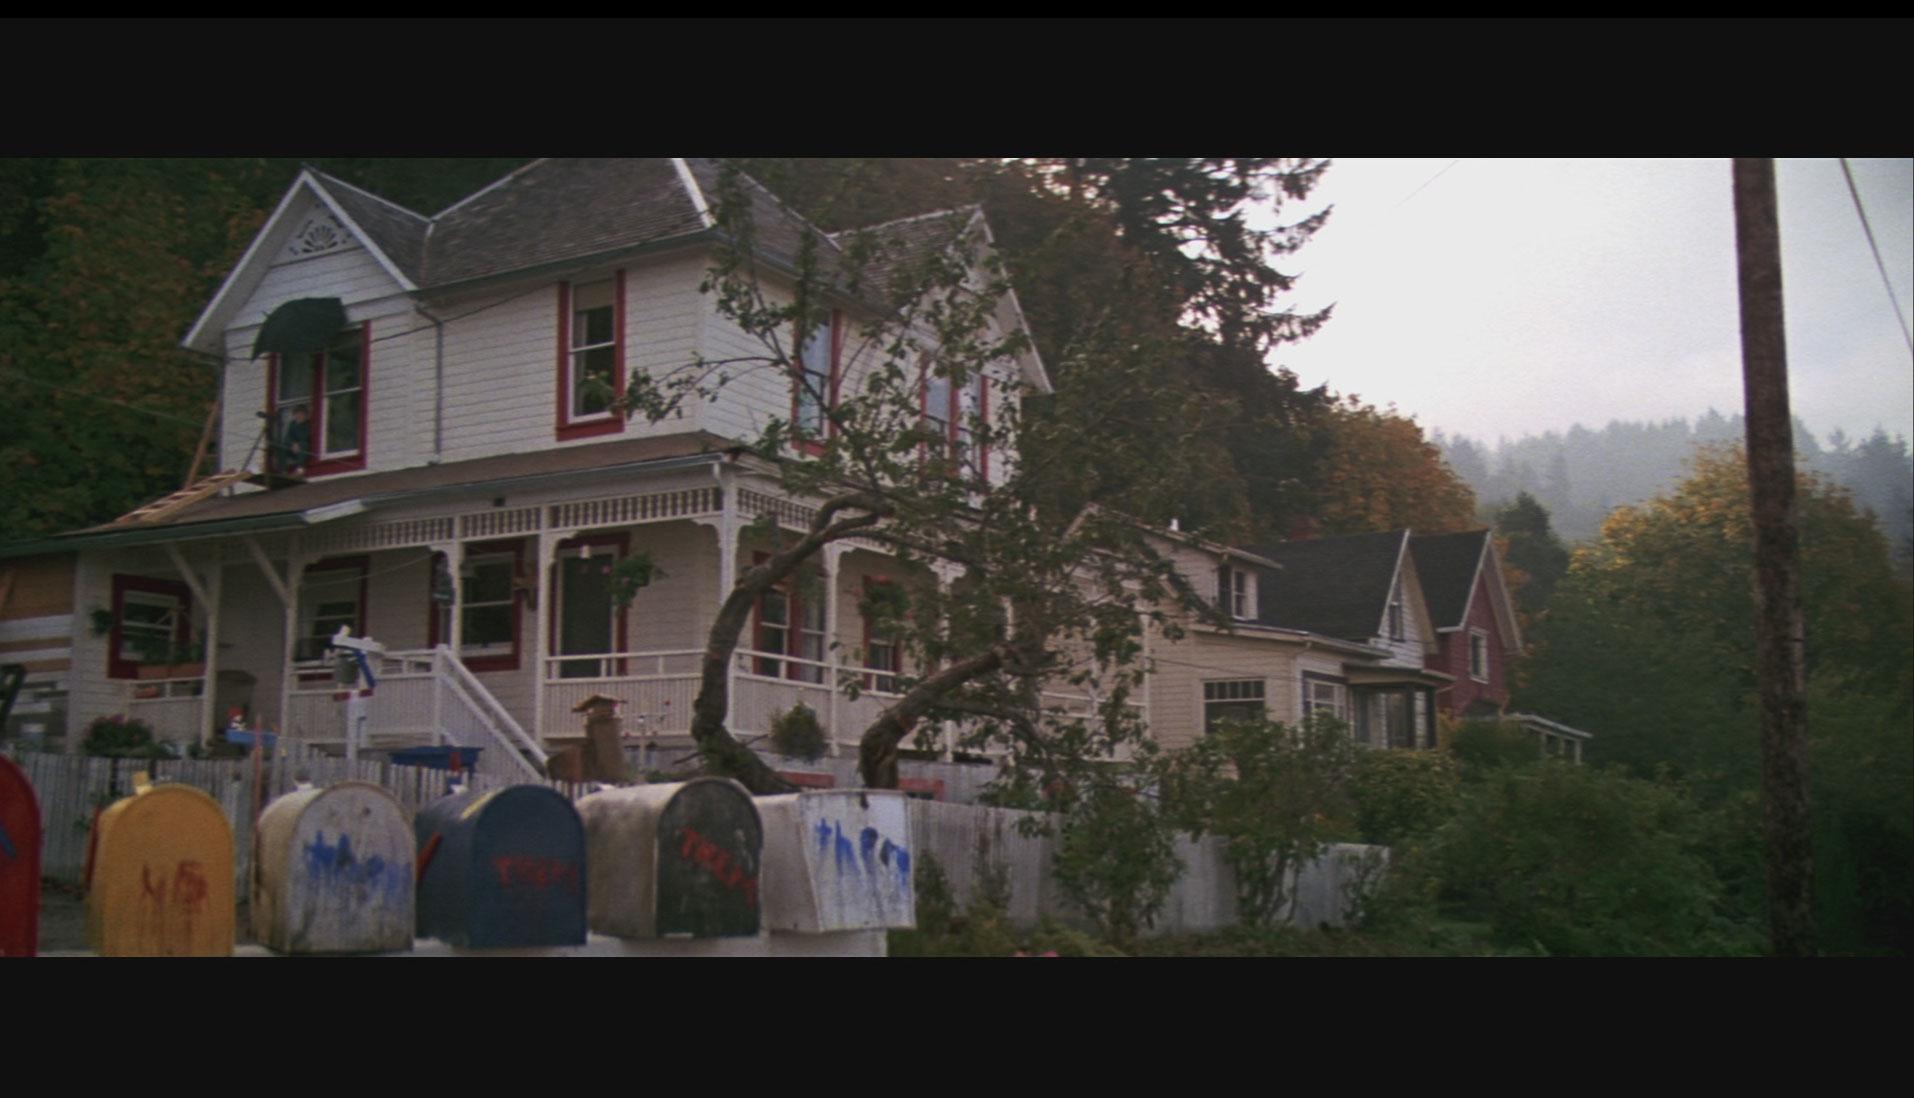 Goonies House in Astoria, Oregon - Film, Movie Screen Shot